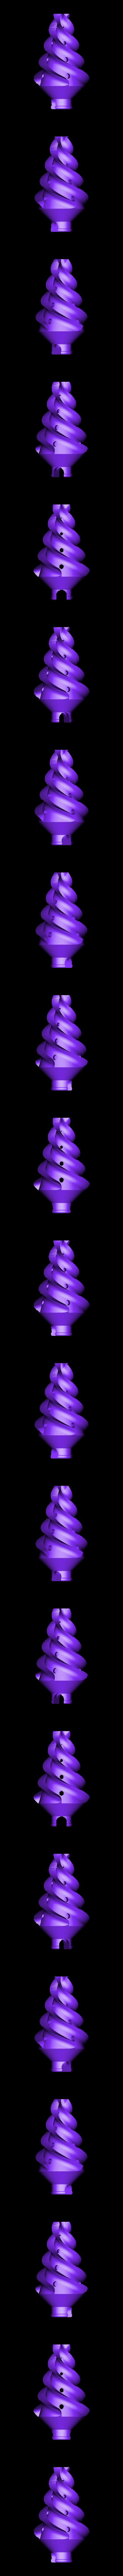 Lemon_Thingy.stl Download free STL file Screw-in Lemon Mister! • 3D printable design, Yuval_Dascalu